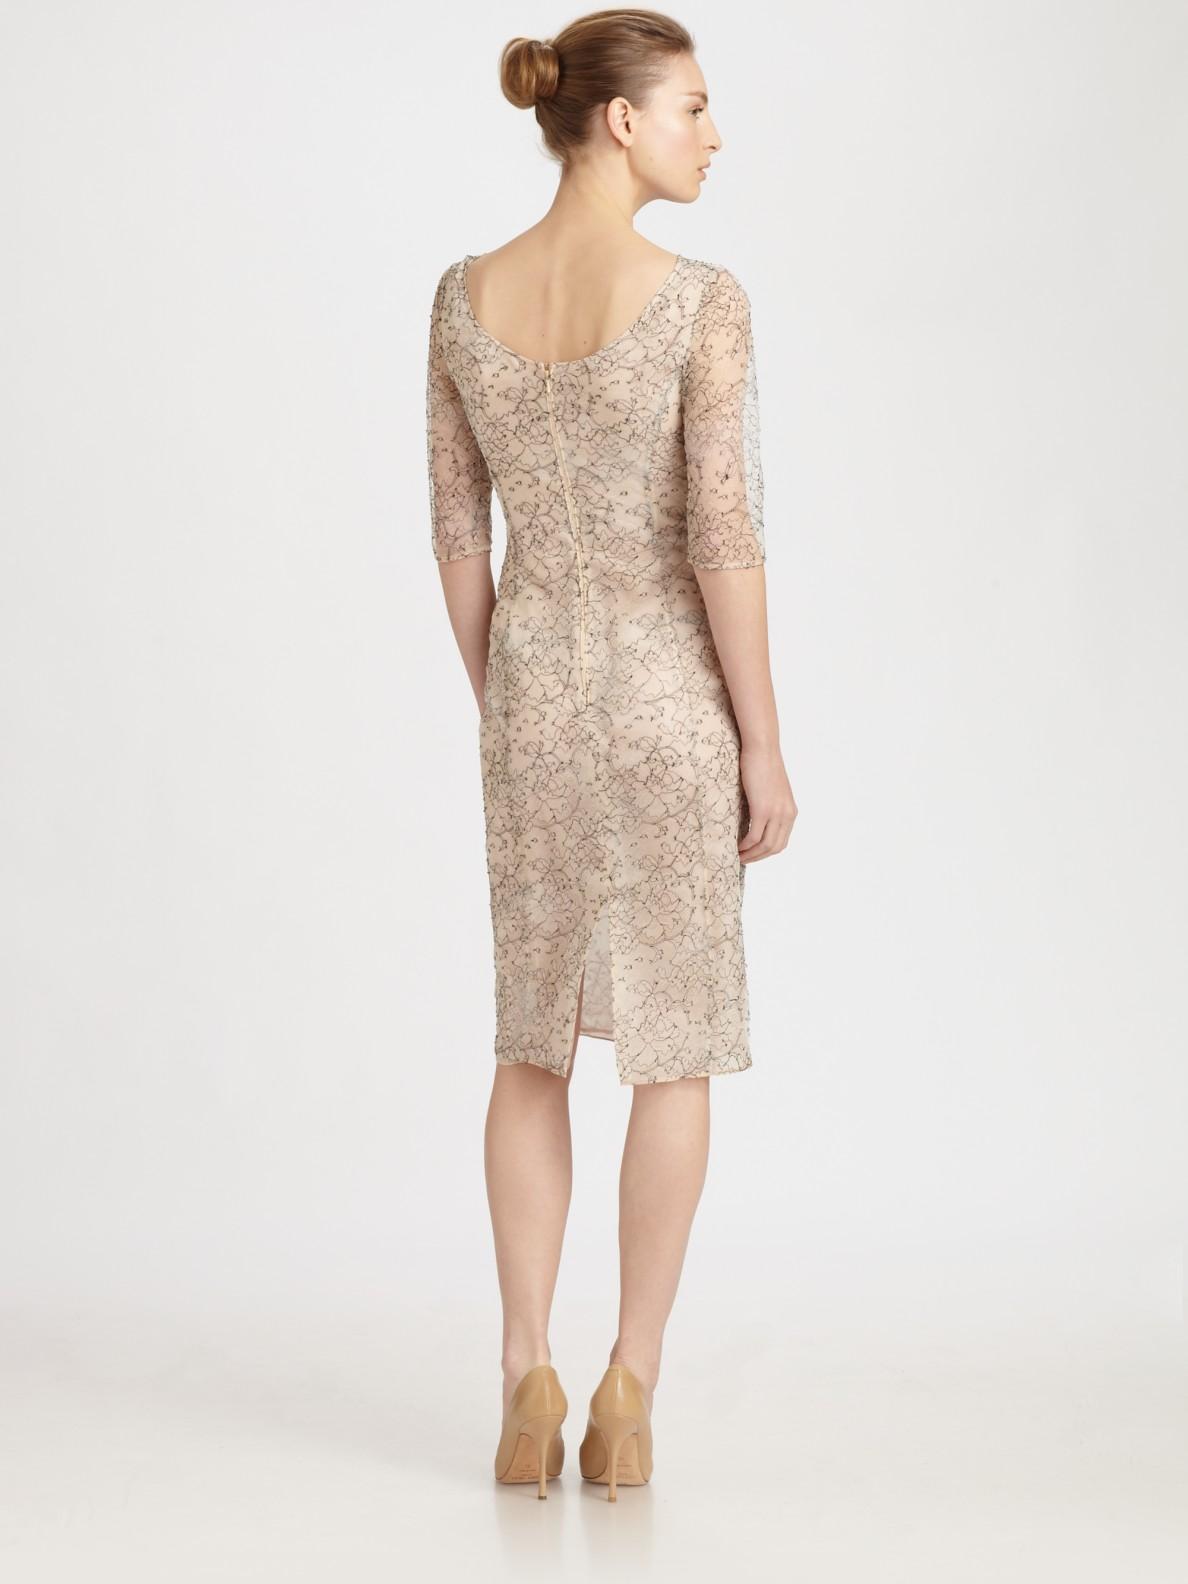 Erdem Lace Dress in Natural | Lyst